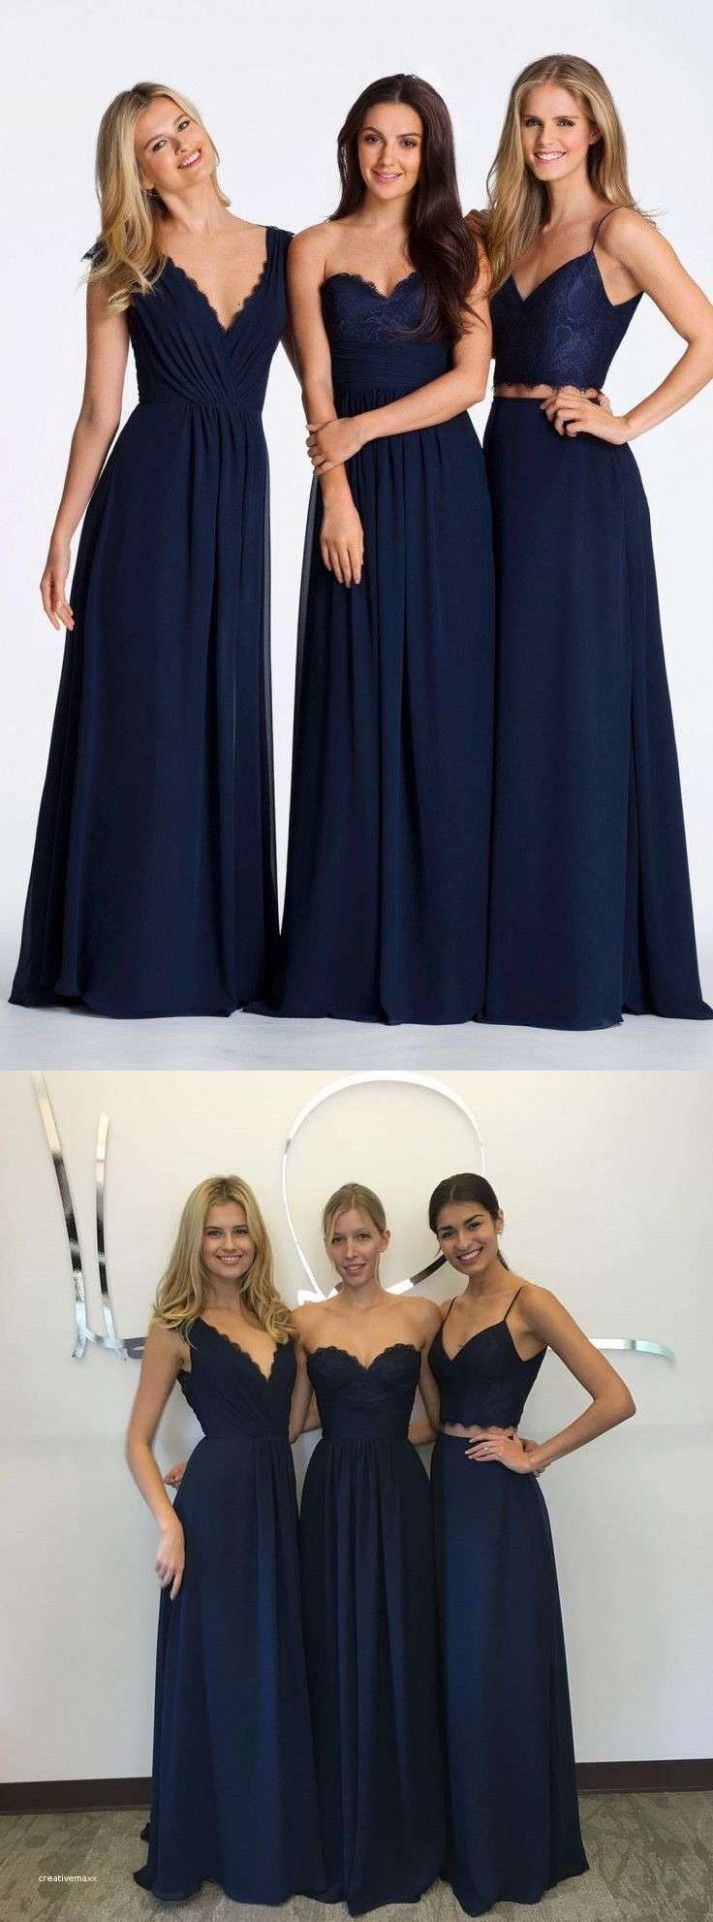 Long navy dress for wedding  Fall wedding bridesmaid dresses gray beautiful best  two piece